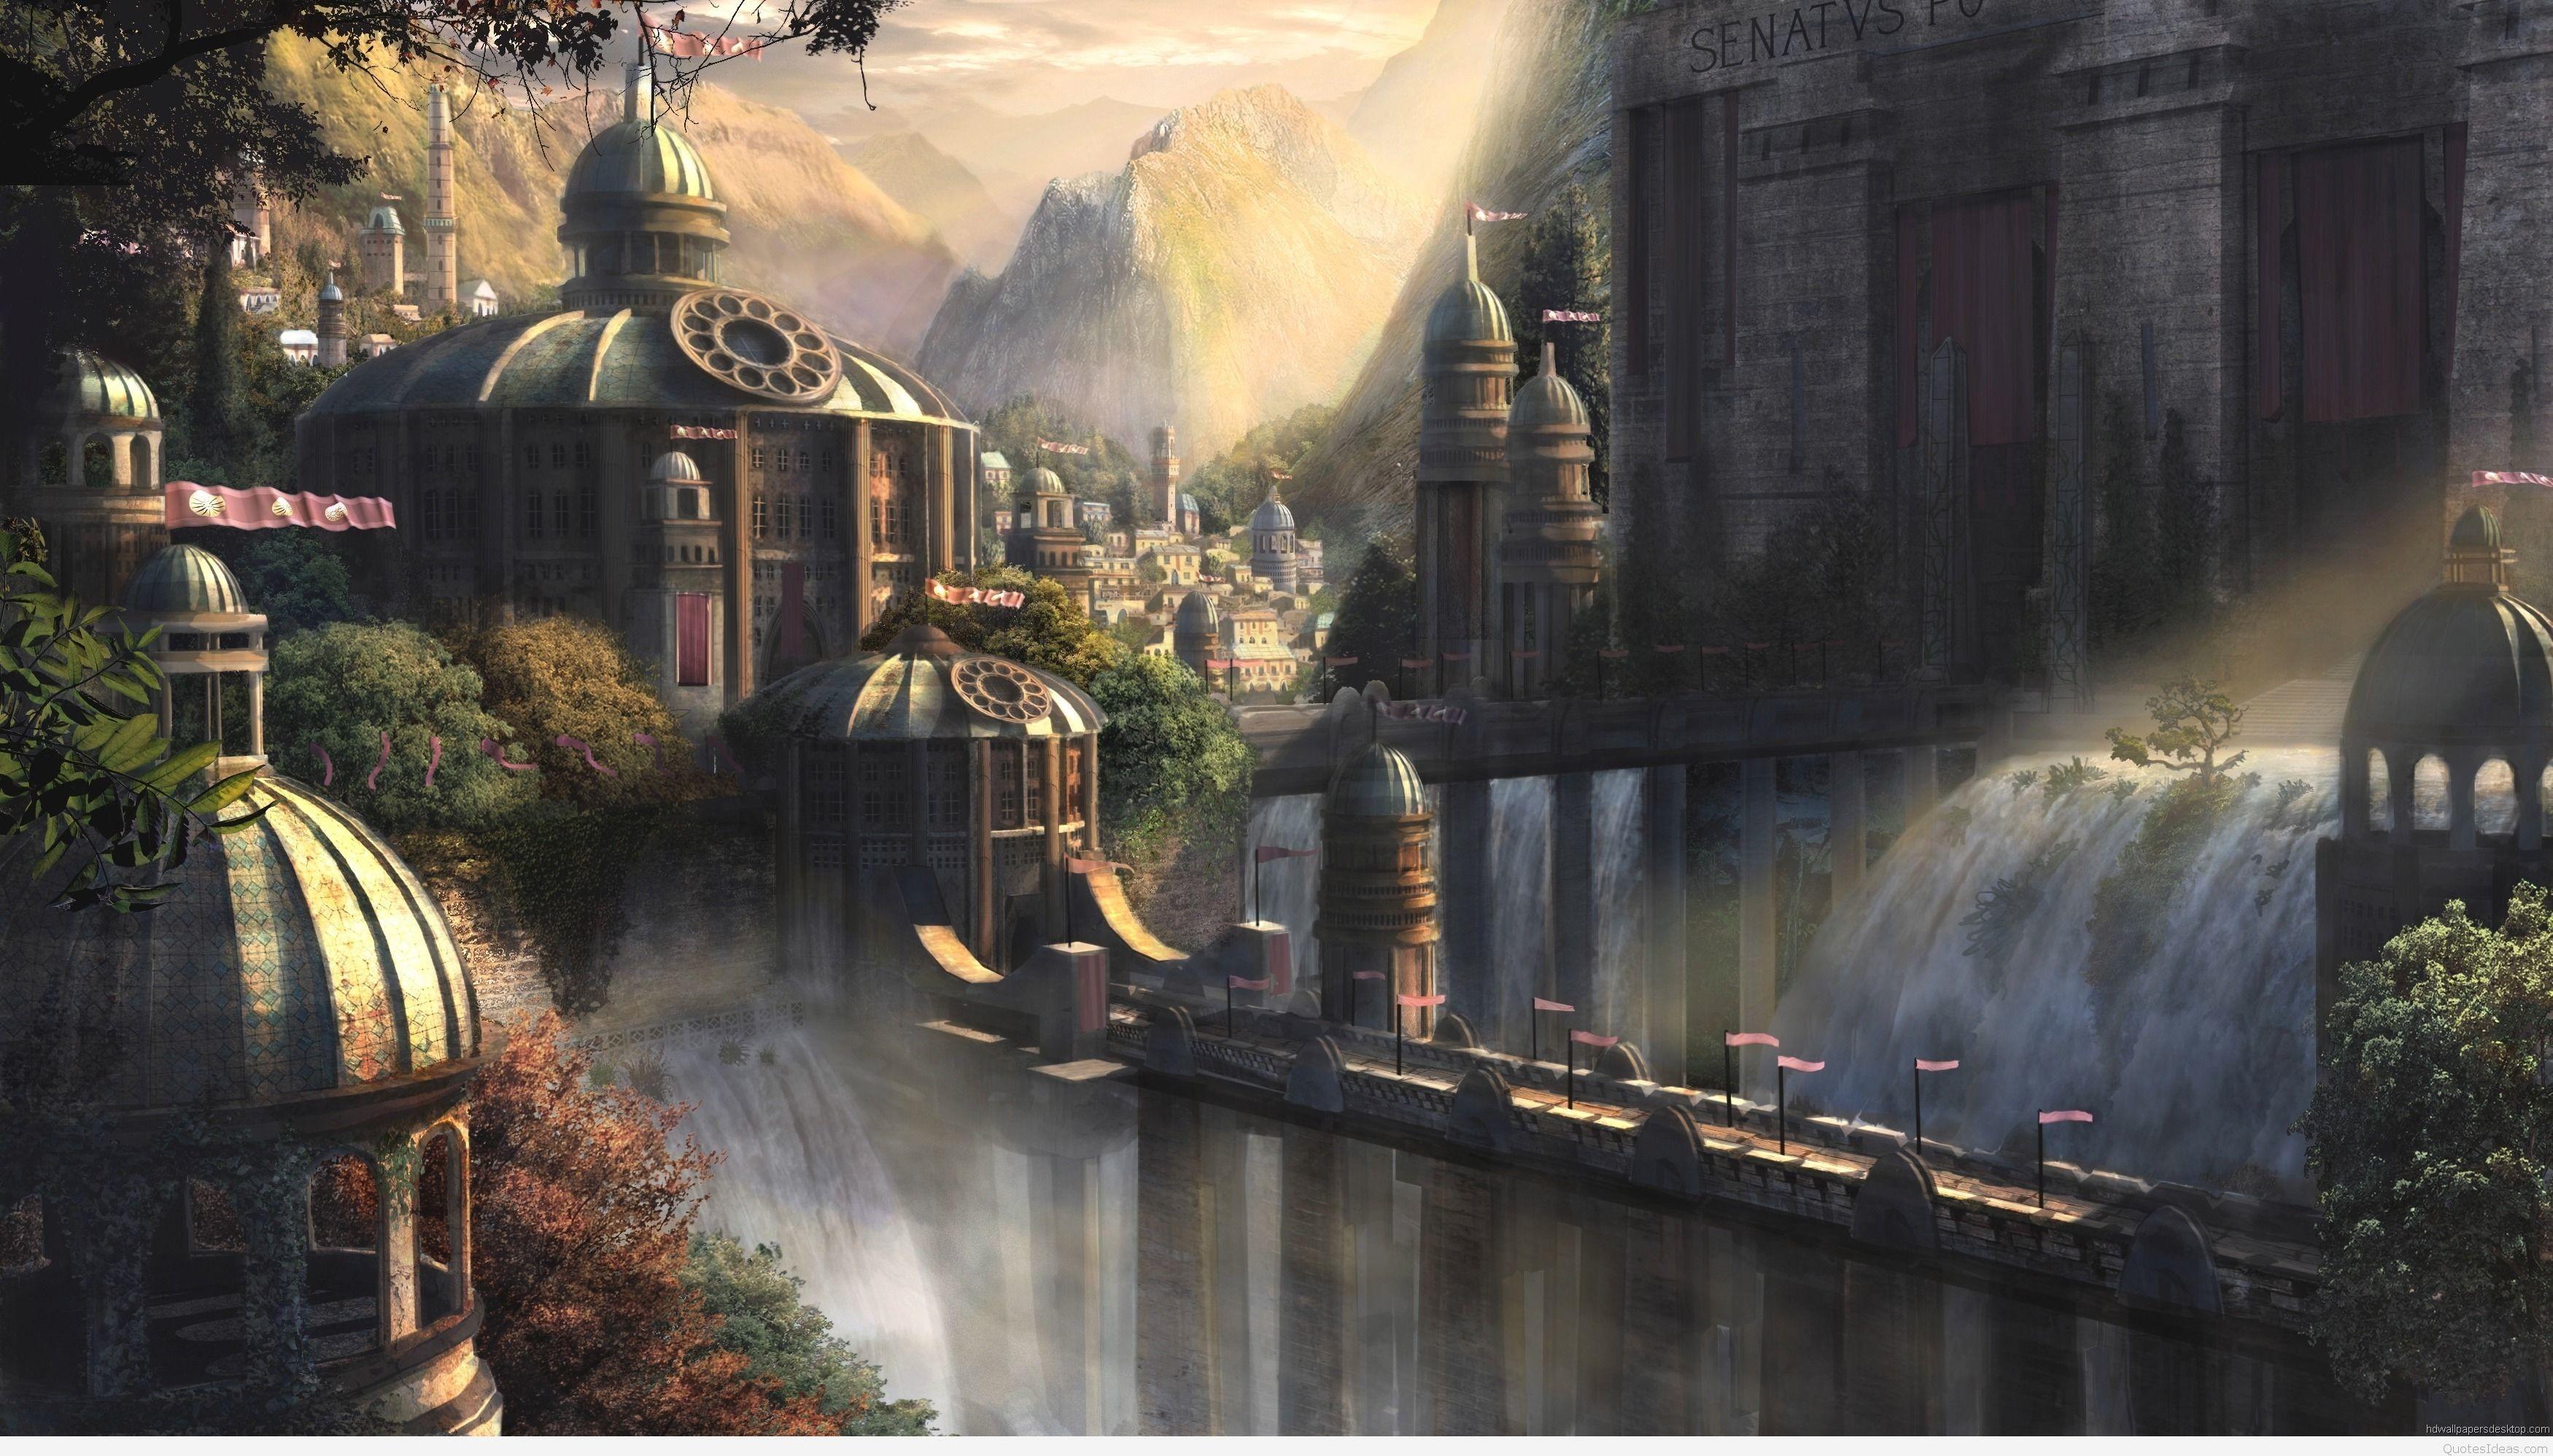 Res: 3500x1996, wallpapers-hd-widescreen-art-wallpapers-fantasy-art-wallpaper-